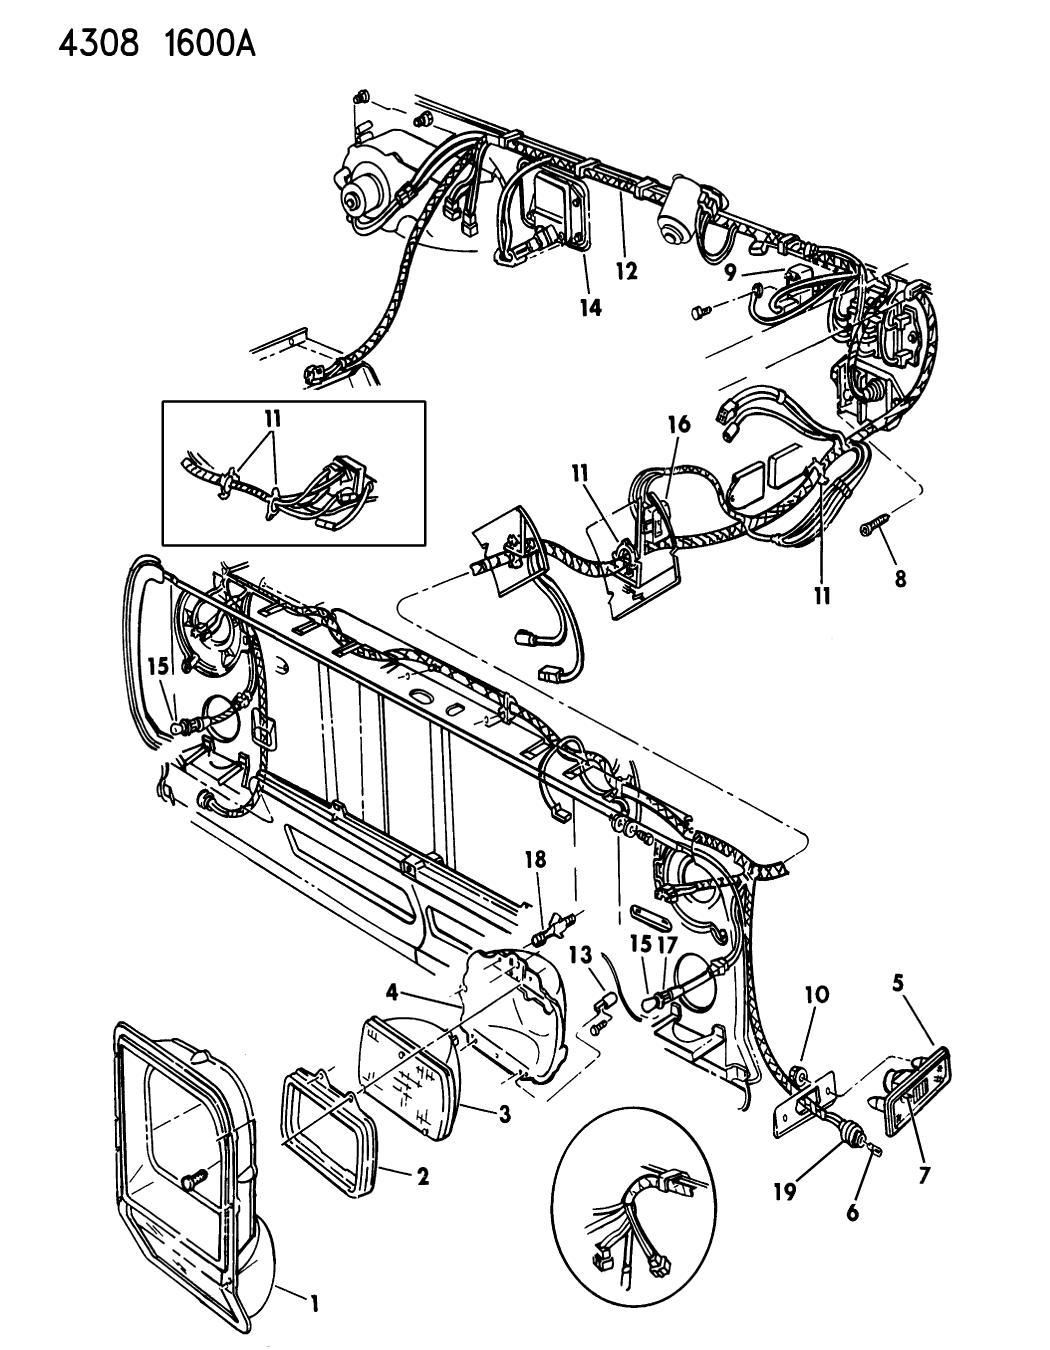 85 Dodge D150 Fuse Diagram - Wiring Diagram Networks